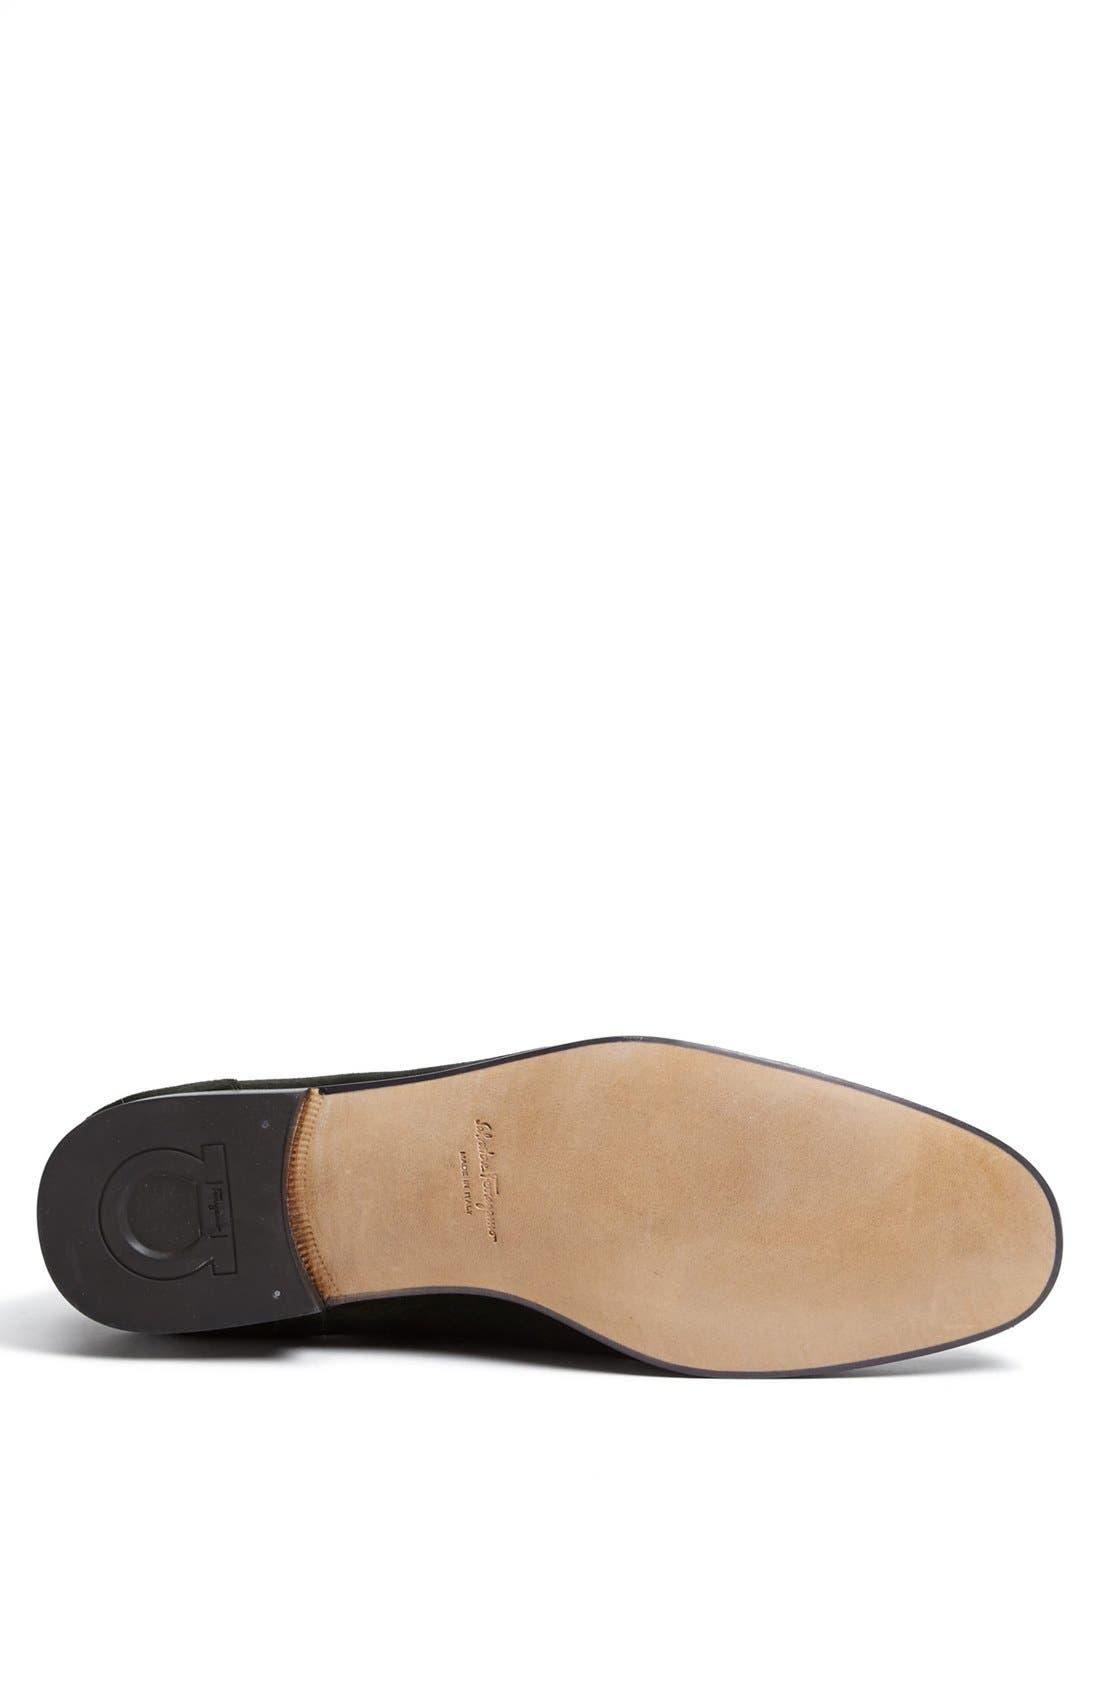 Alternate Image 4  - Salvatore Ferragamo 'Tapas' Suede Bit Loafer